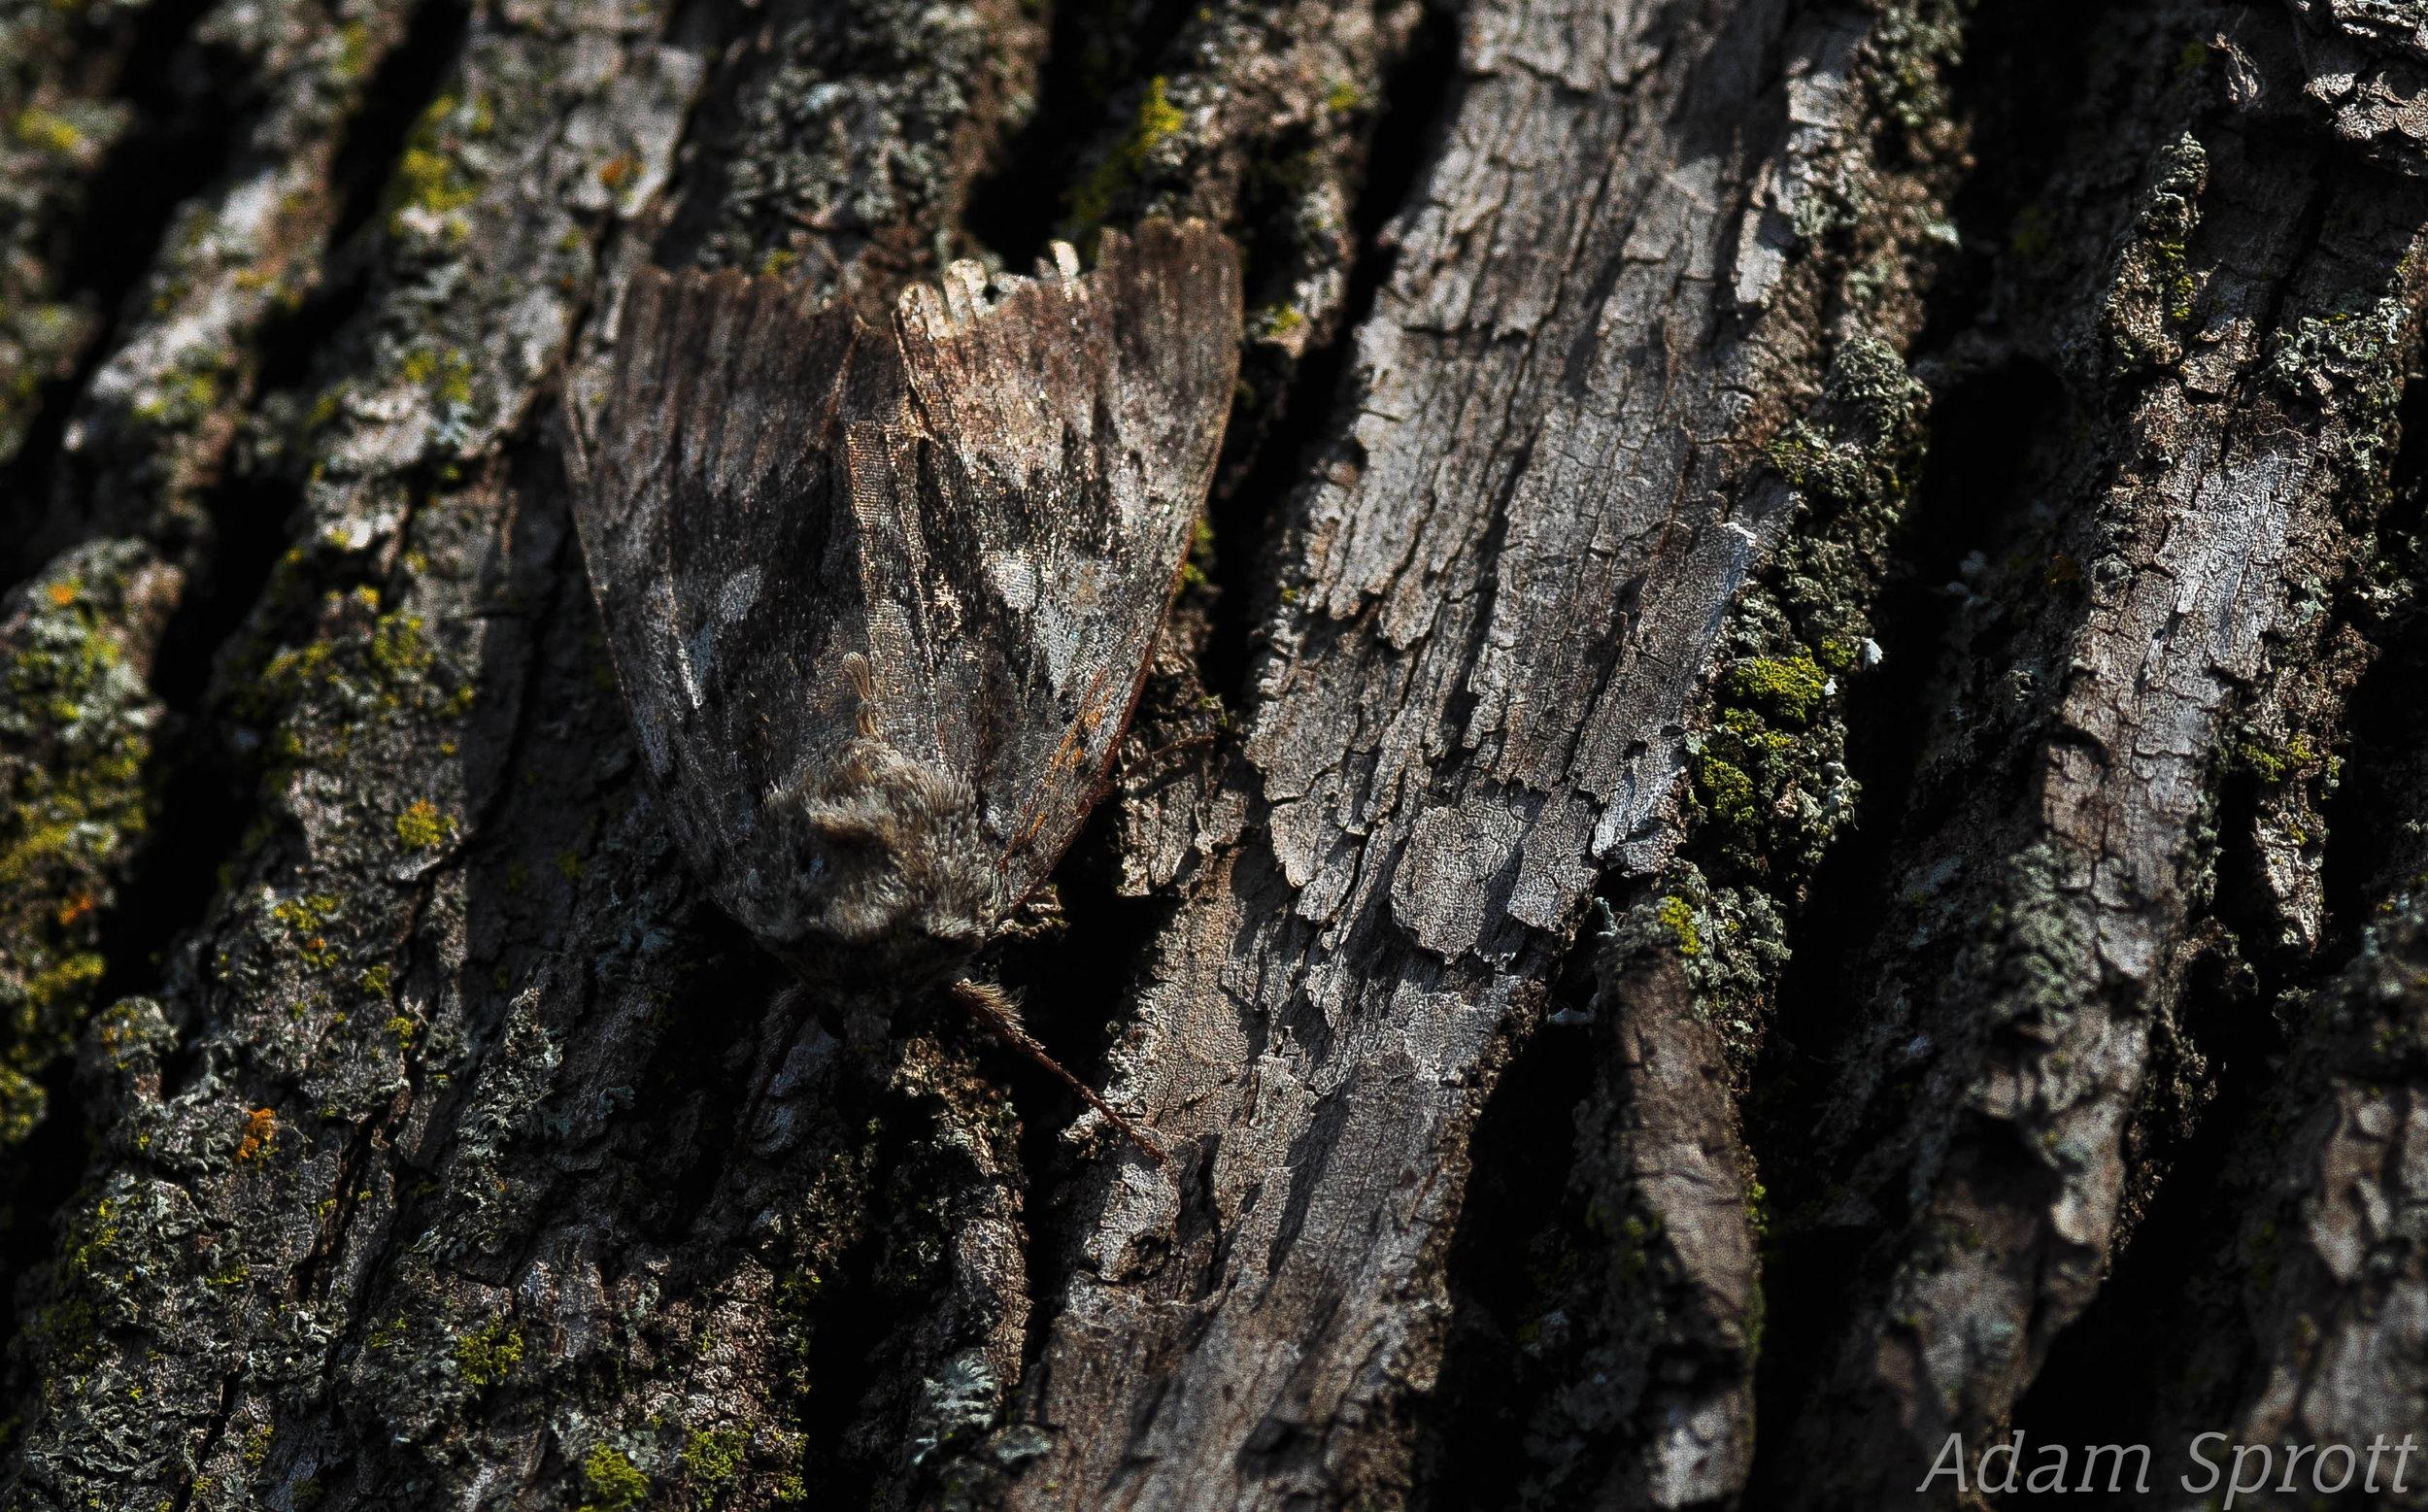 Lepidoptera 1 - Confused Woodgrain (Morrisonia confusa).jpg